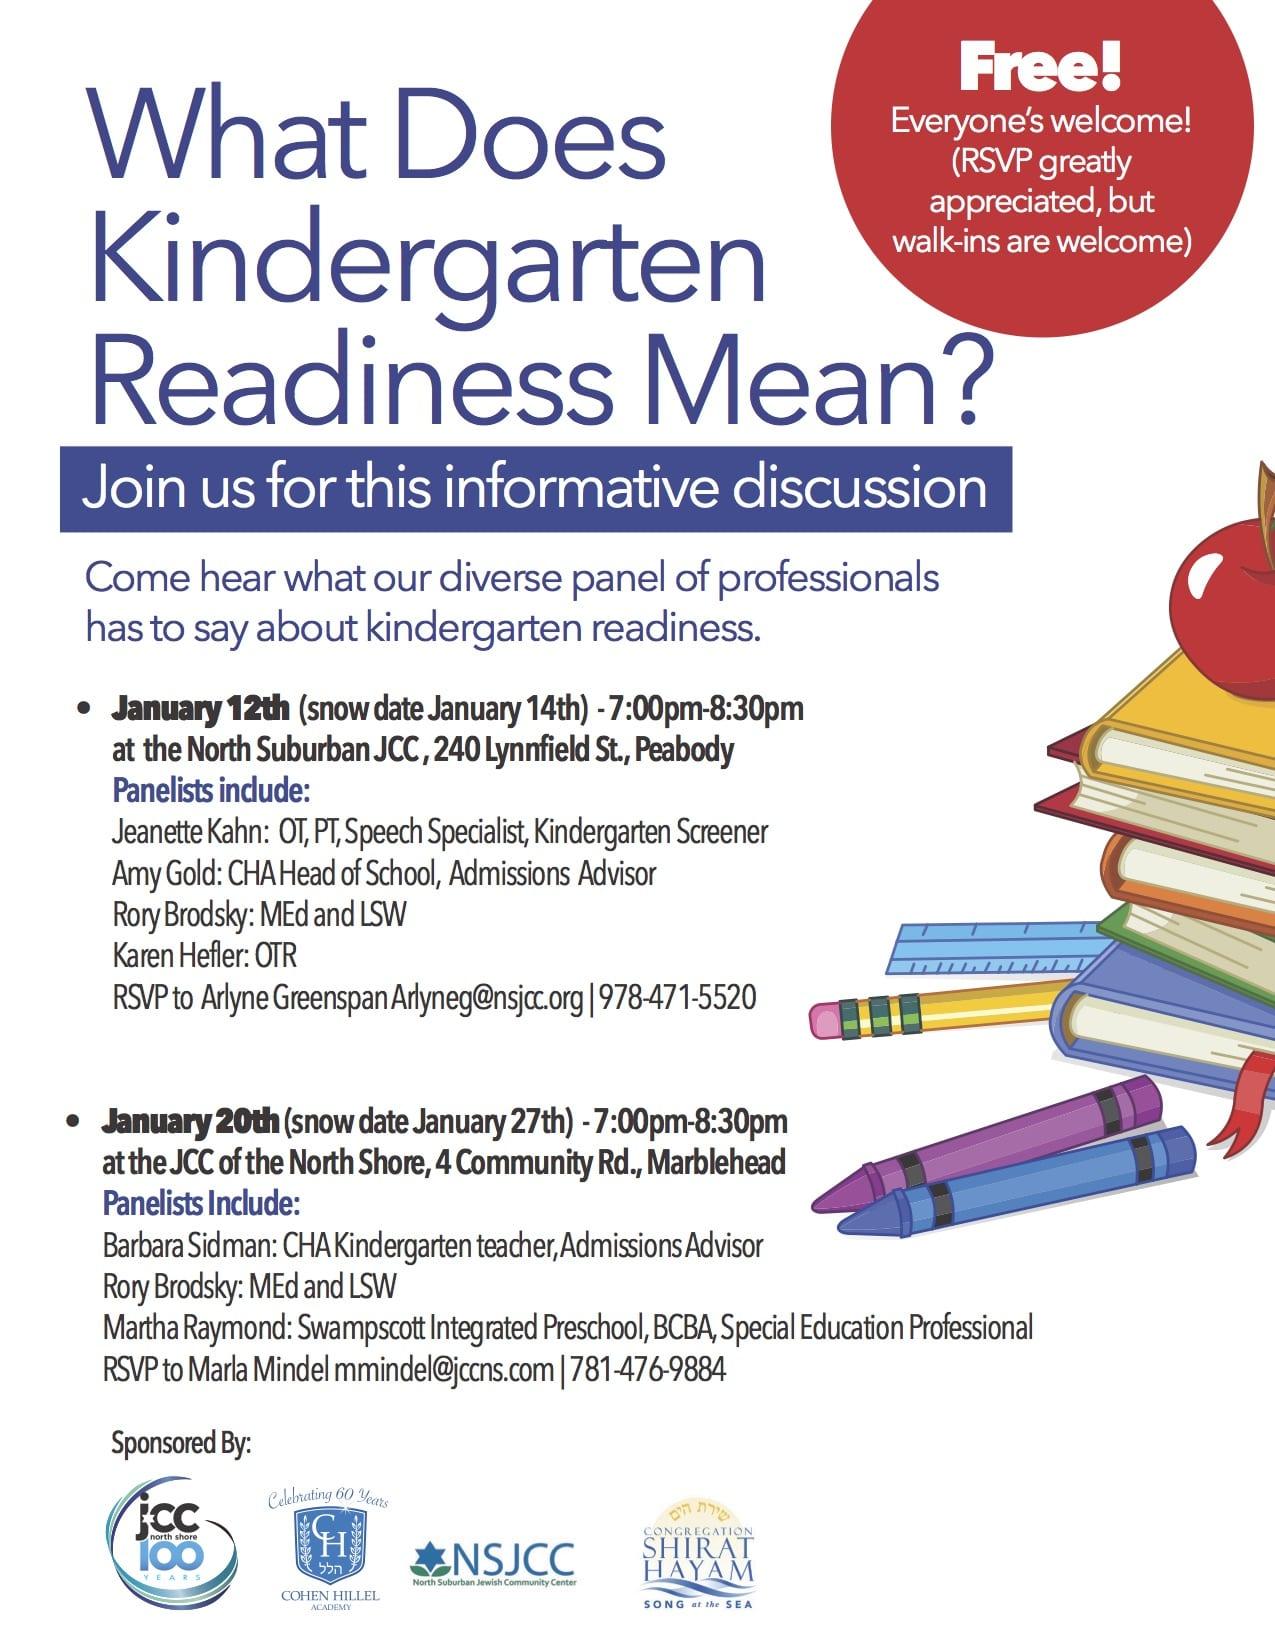 Kindergarten Readiness Calendar United Way : What does kindergarten readiness mean